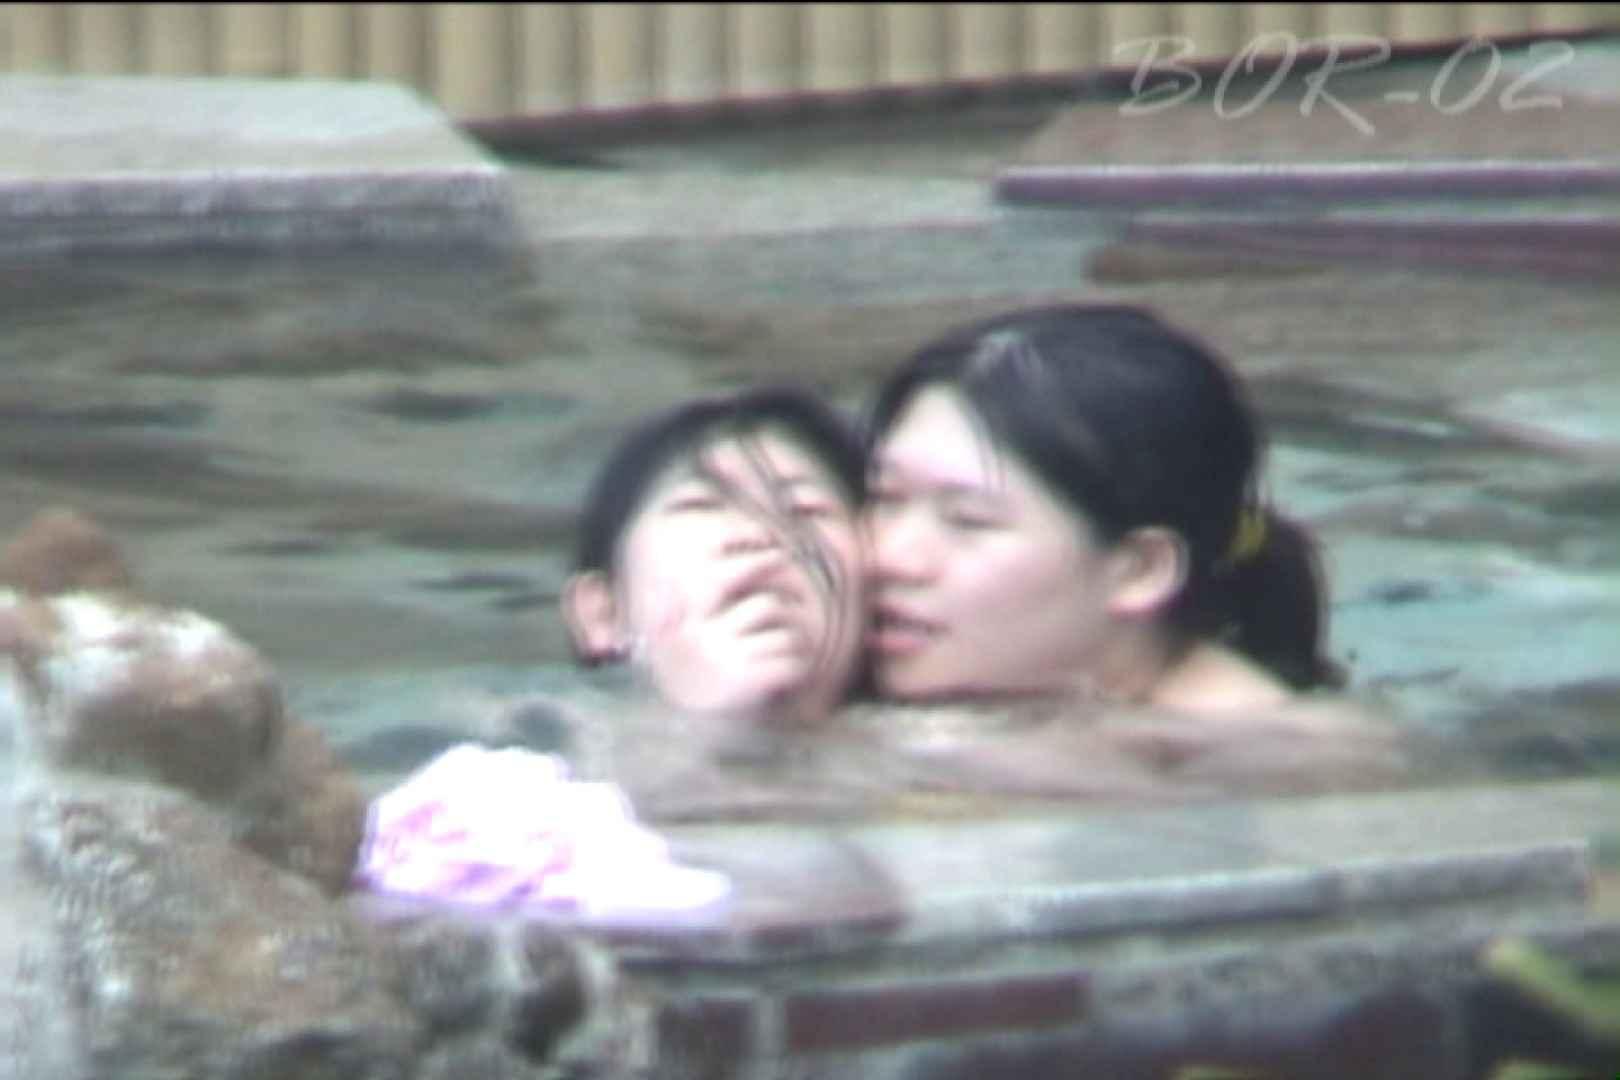 Aquaな露天風呂Vol.471 盗撮 | HなOL  66pic 1